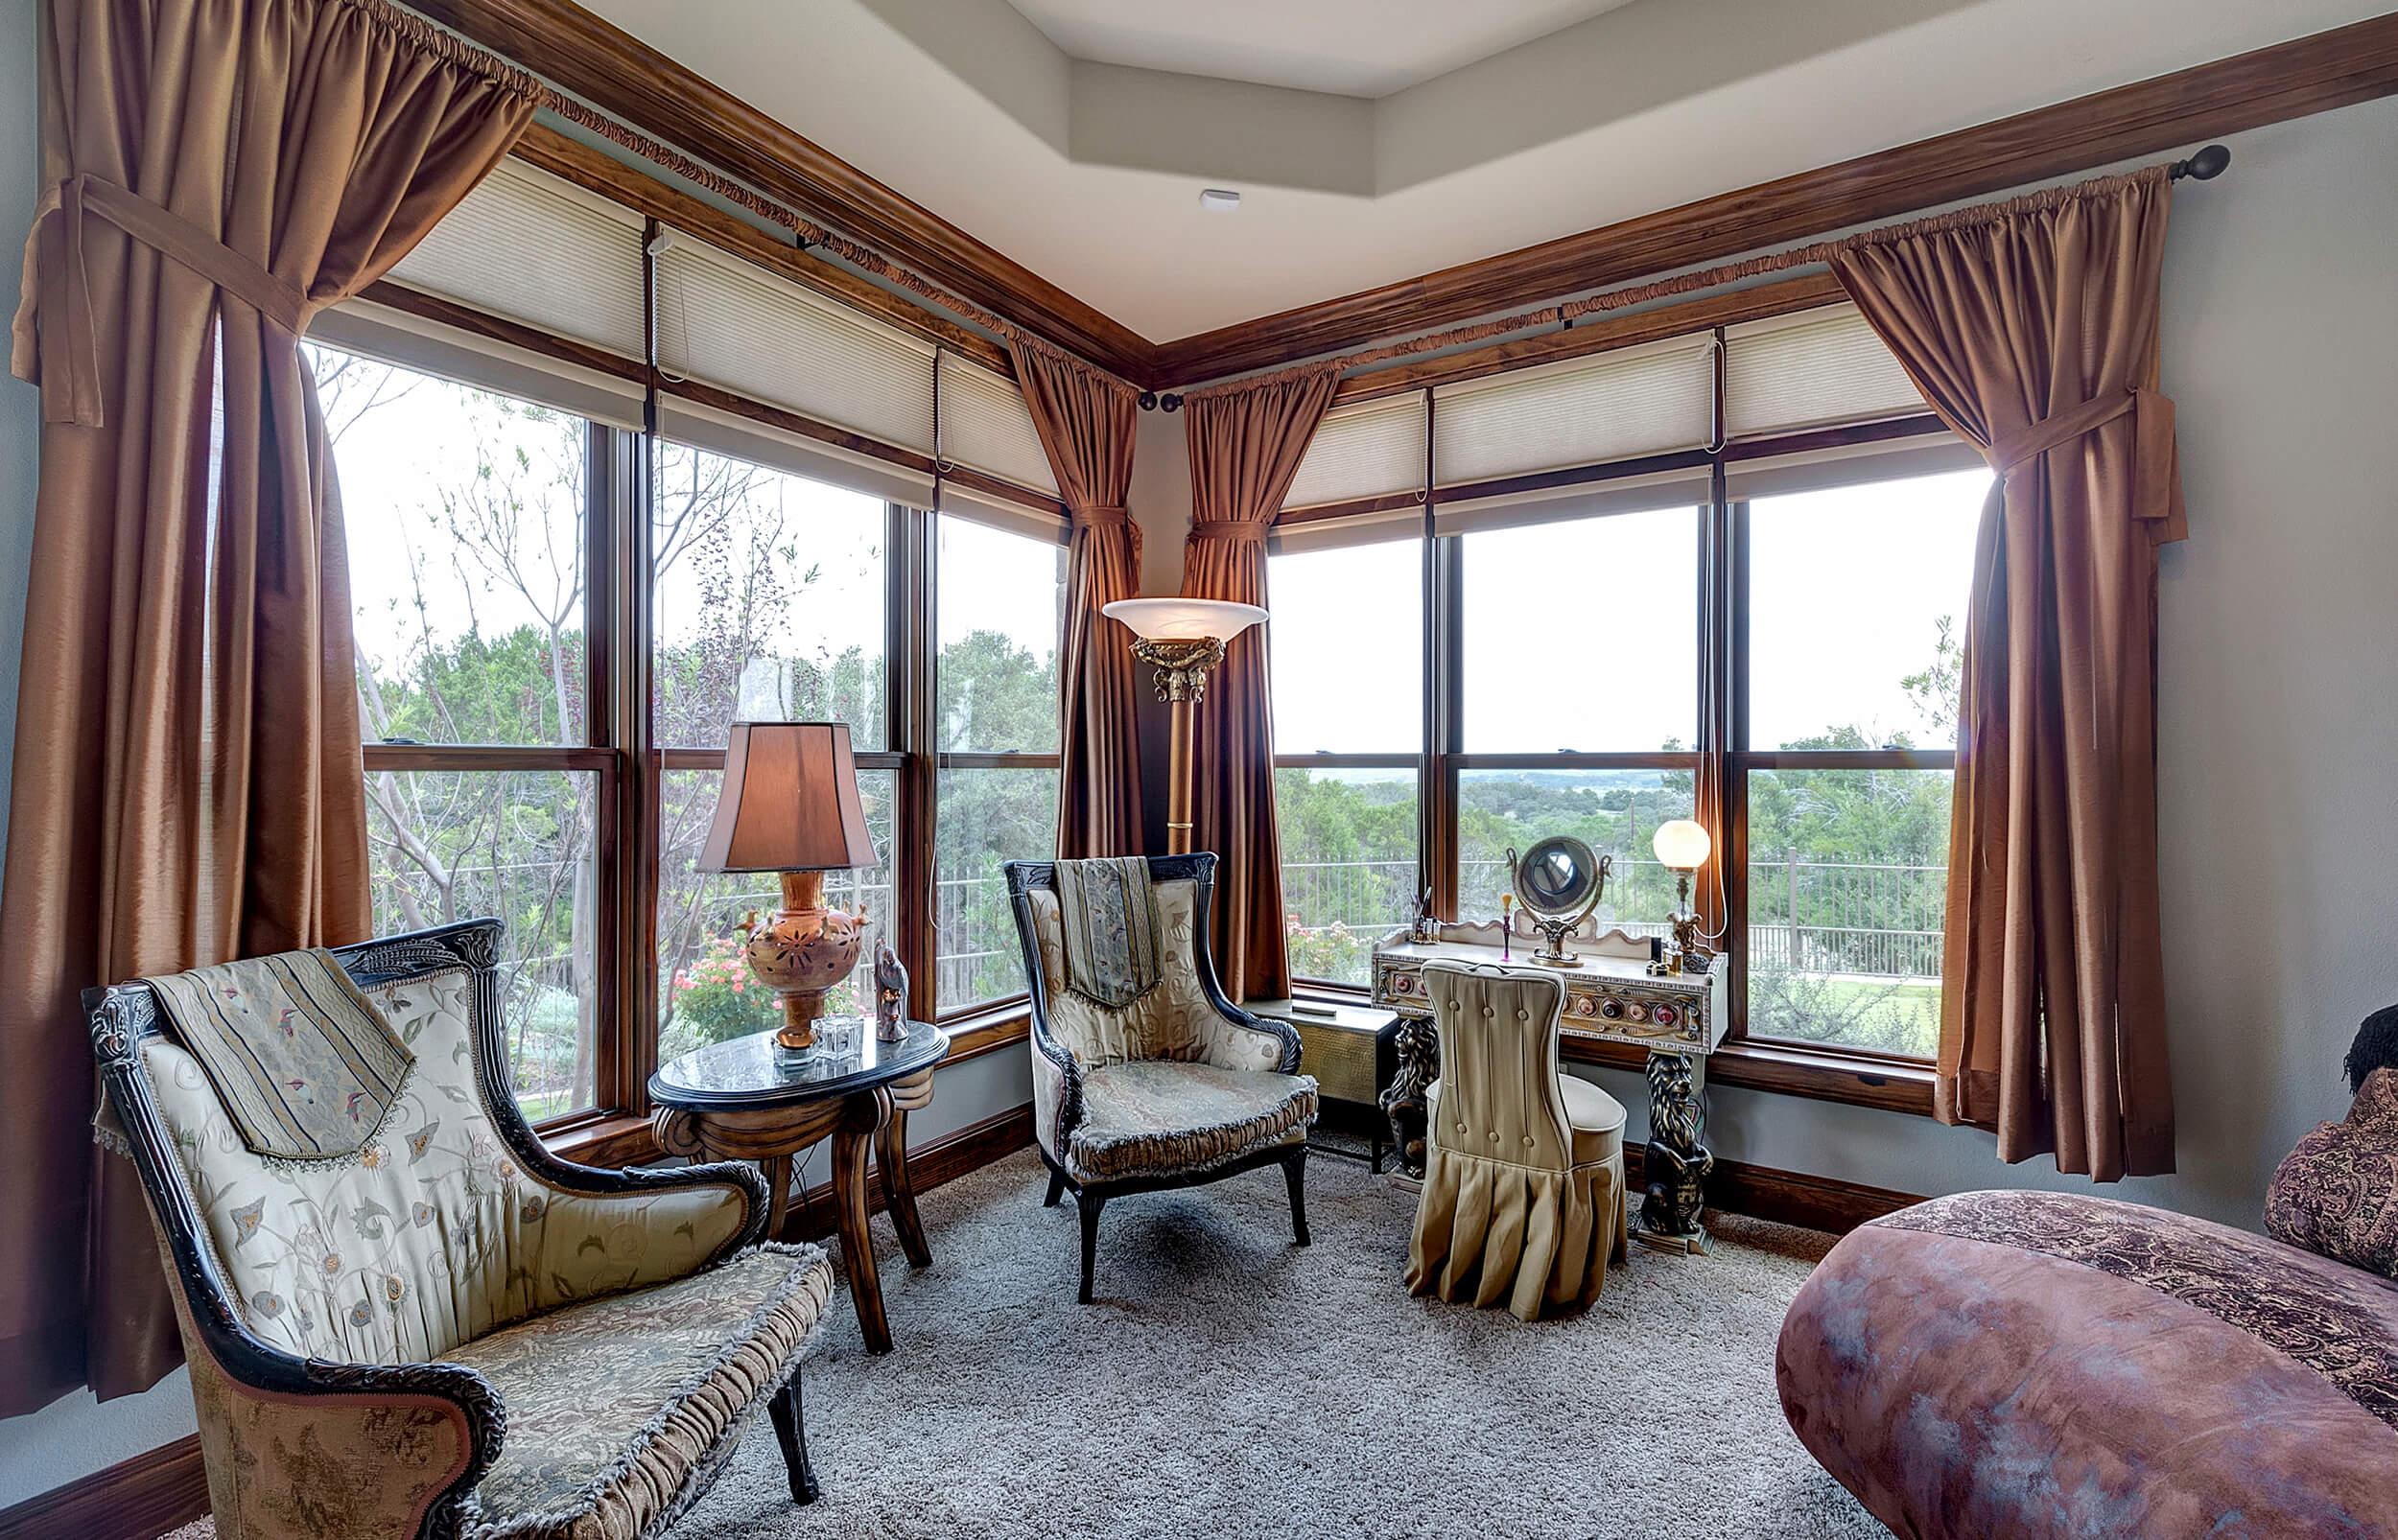 Steve Bumpas Custom Homes Ridgeview 14 Homebuilder Remodel Granbury Brazos Bend Cresson DeCordova Pecan Plantation Tolar Glen Rose Fort Worth.jpg